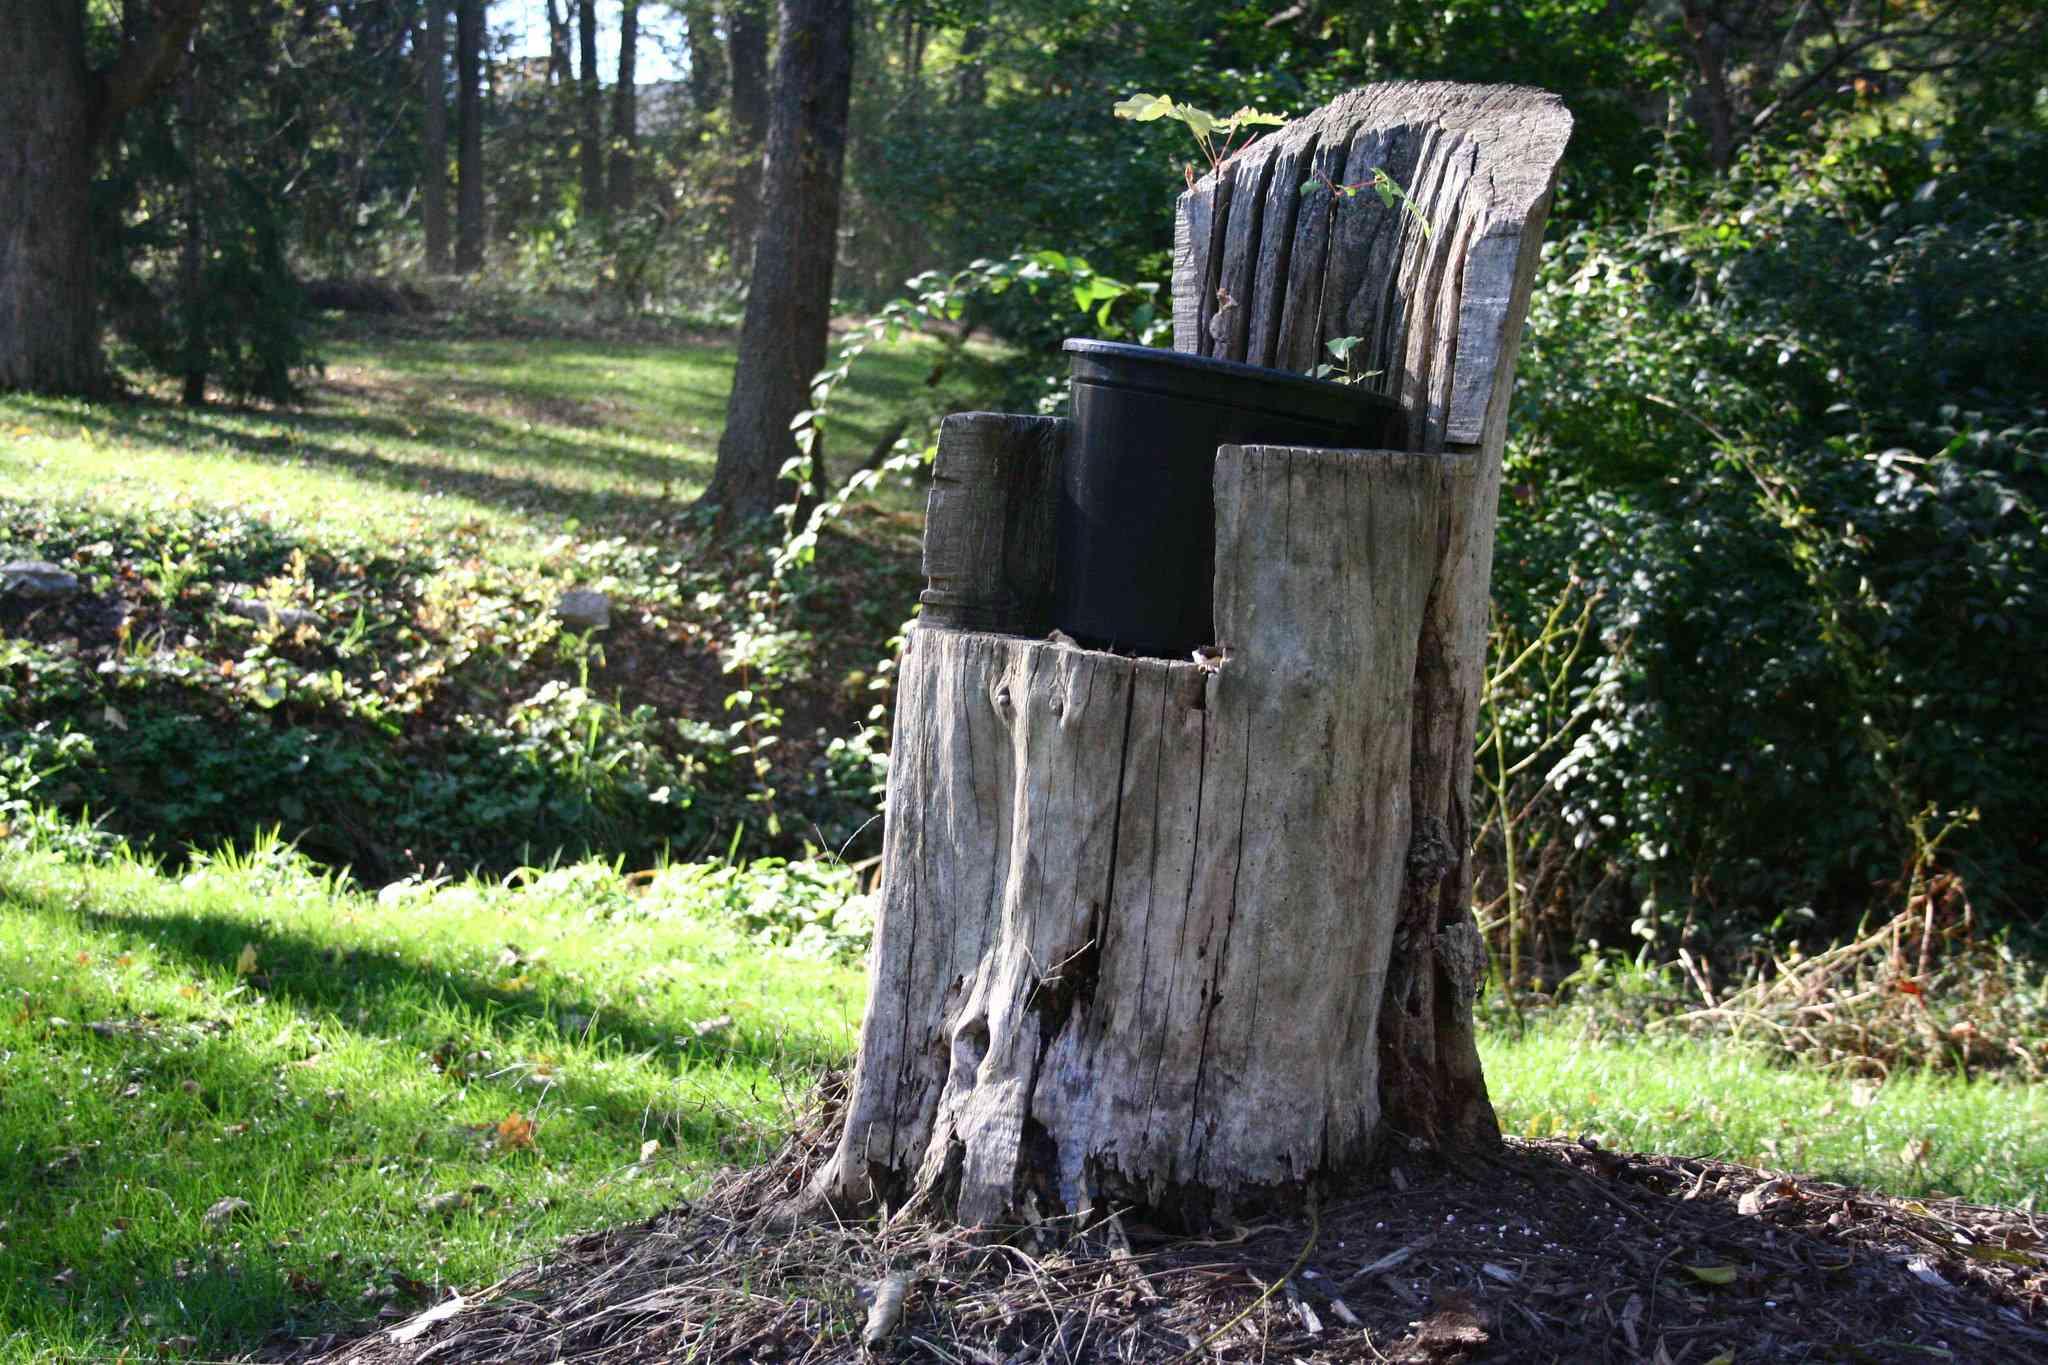 Tree stump chair holding a flower pot